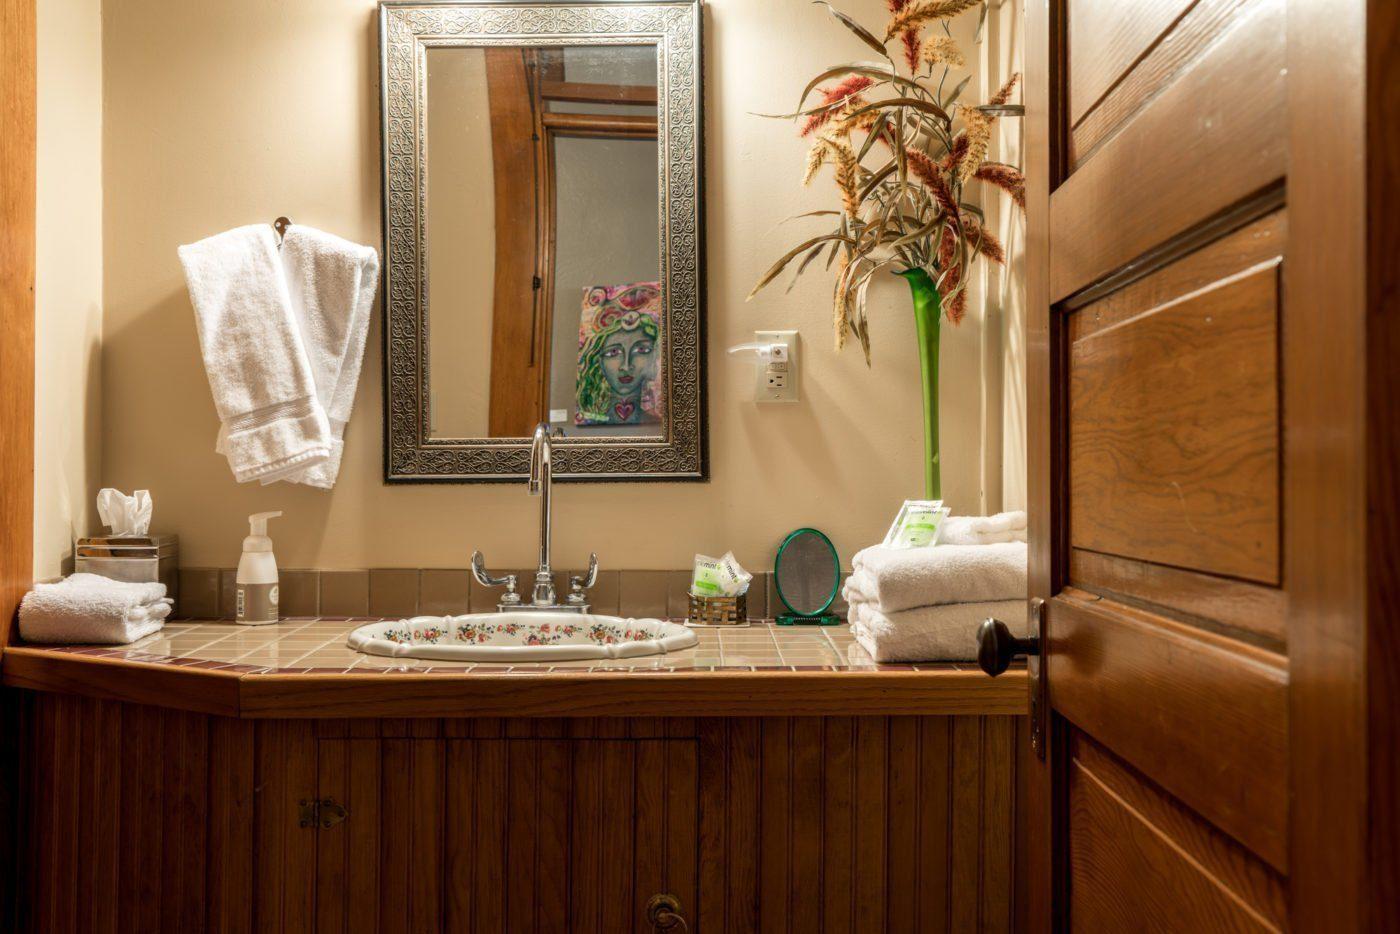 Balch Hotel shared bathroom